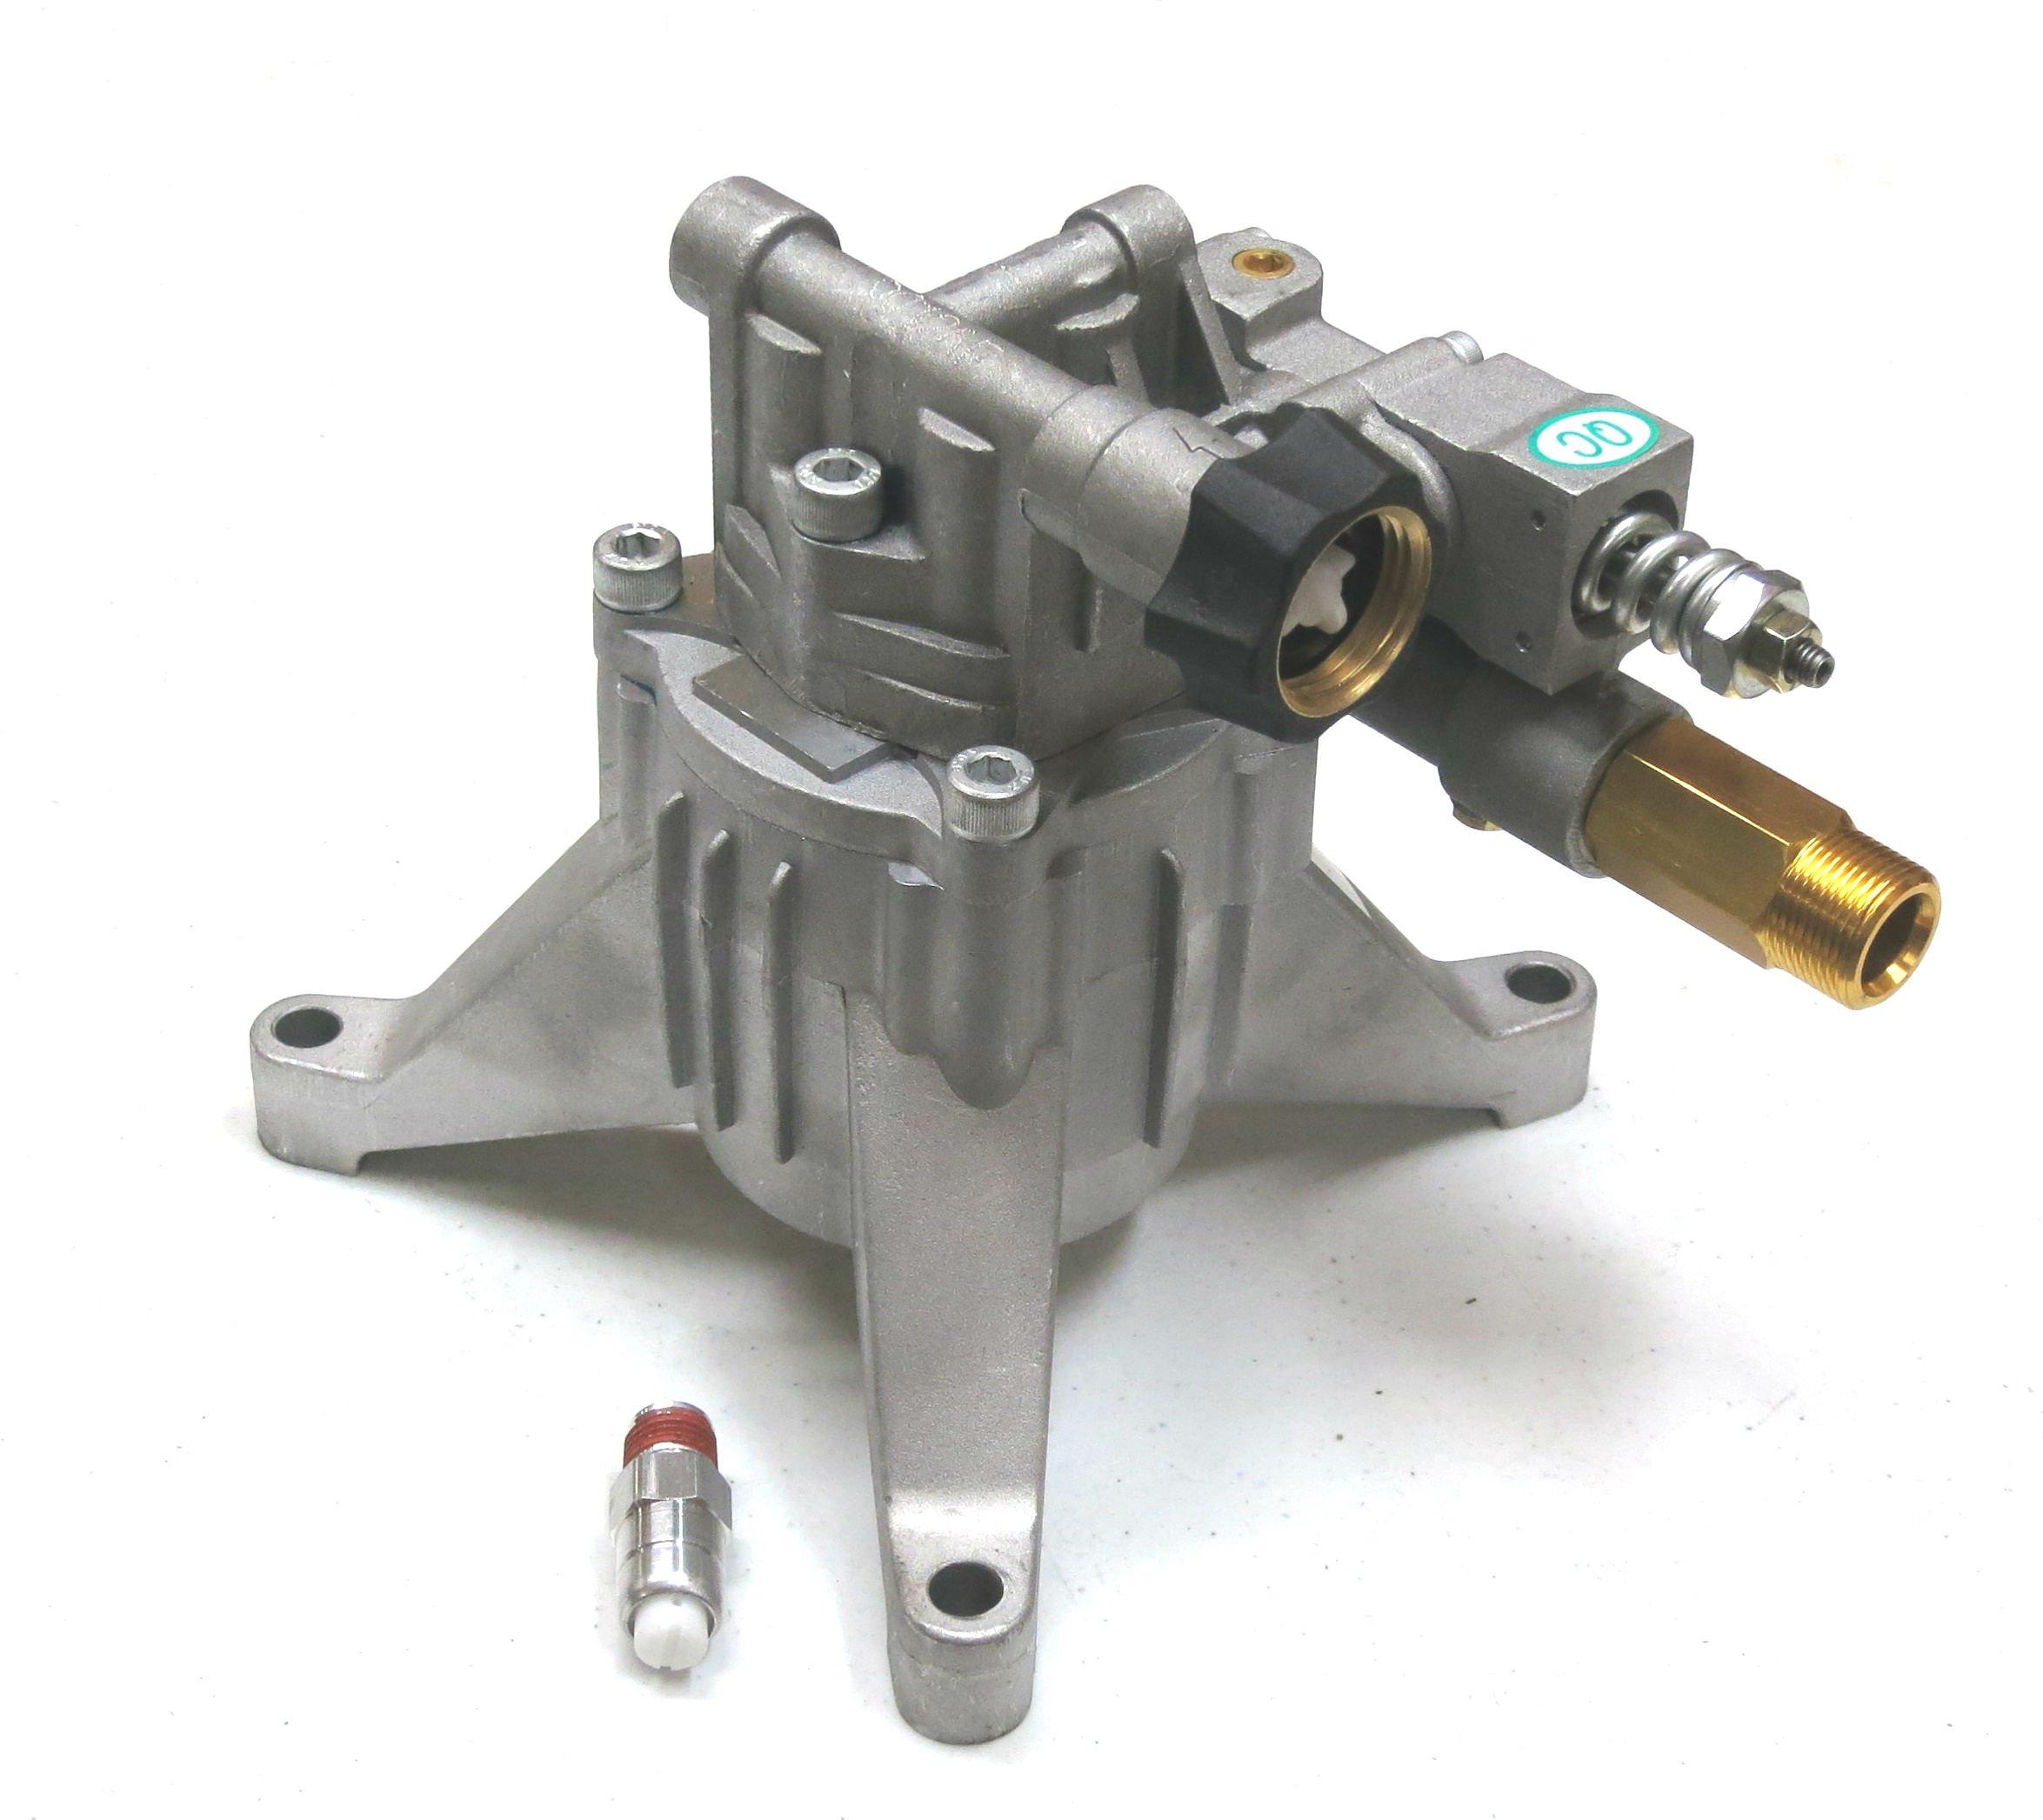 Homelite PowerStroke 308653045 308653025 308653006 2800 psi pressure washer pump